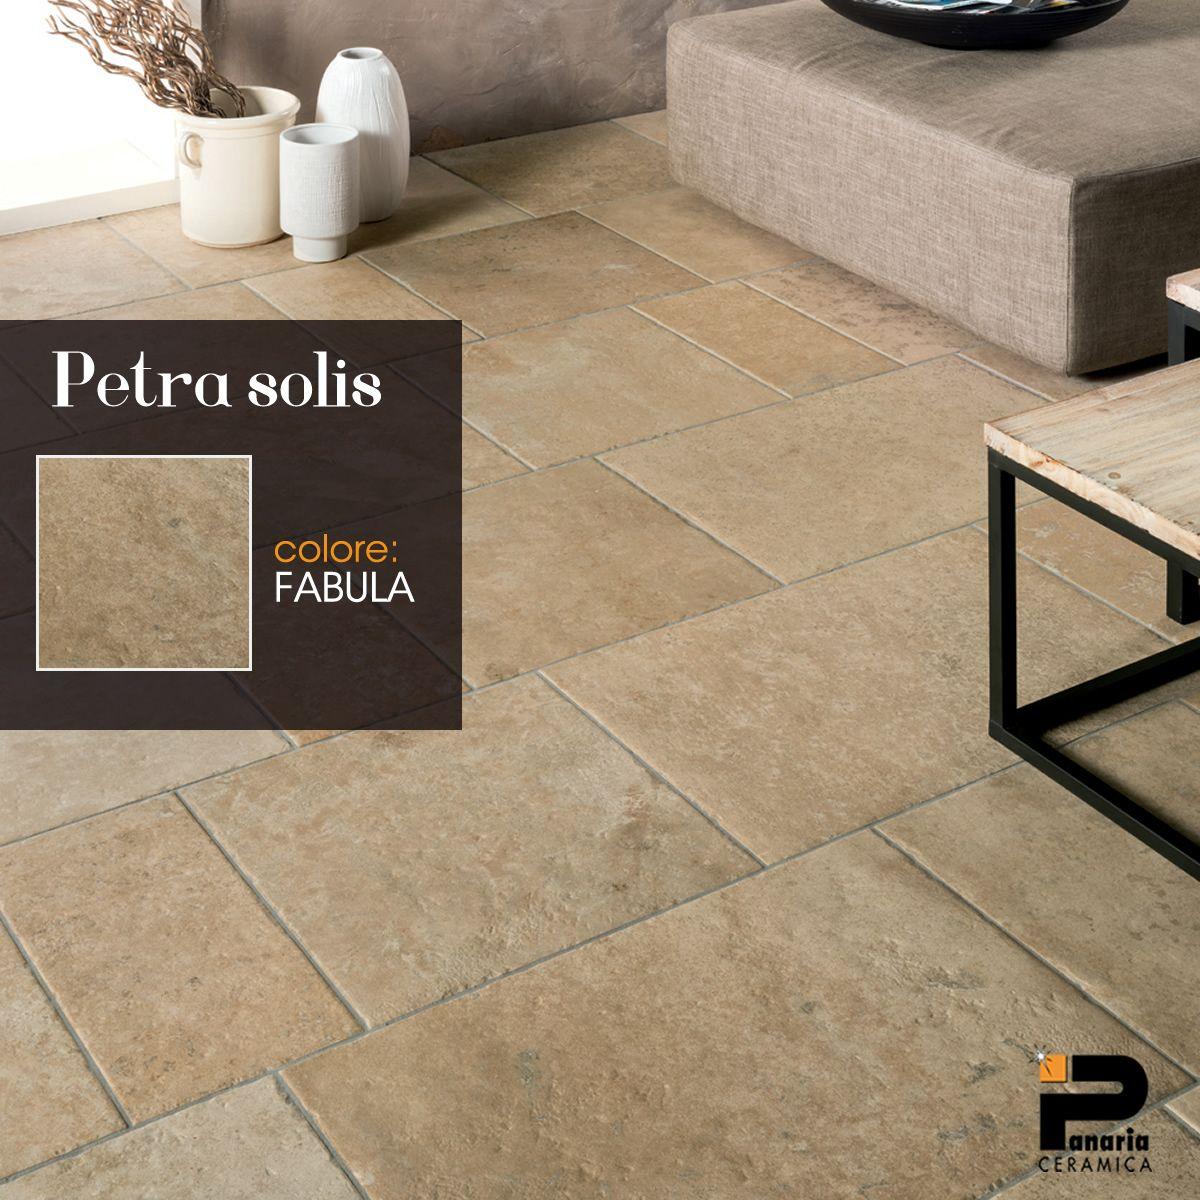 petrasolis by ceramicapanaria gres tiles ceramics. Black Bedroom Furniture Sets. Home Design Ideas